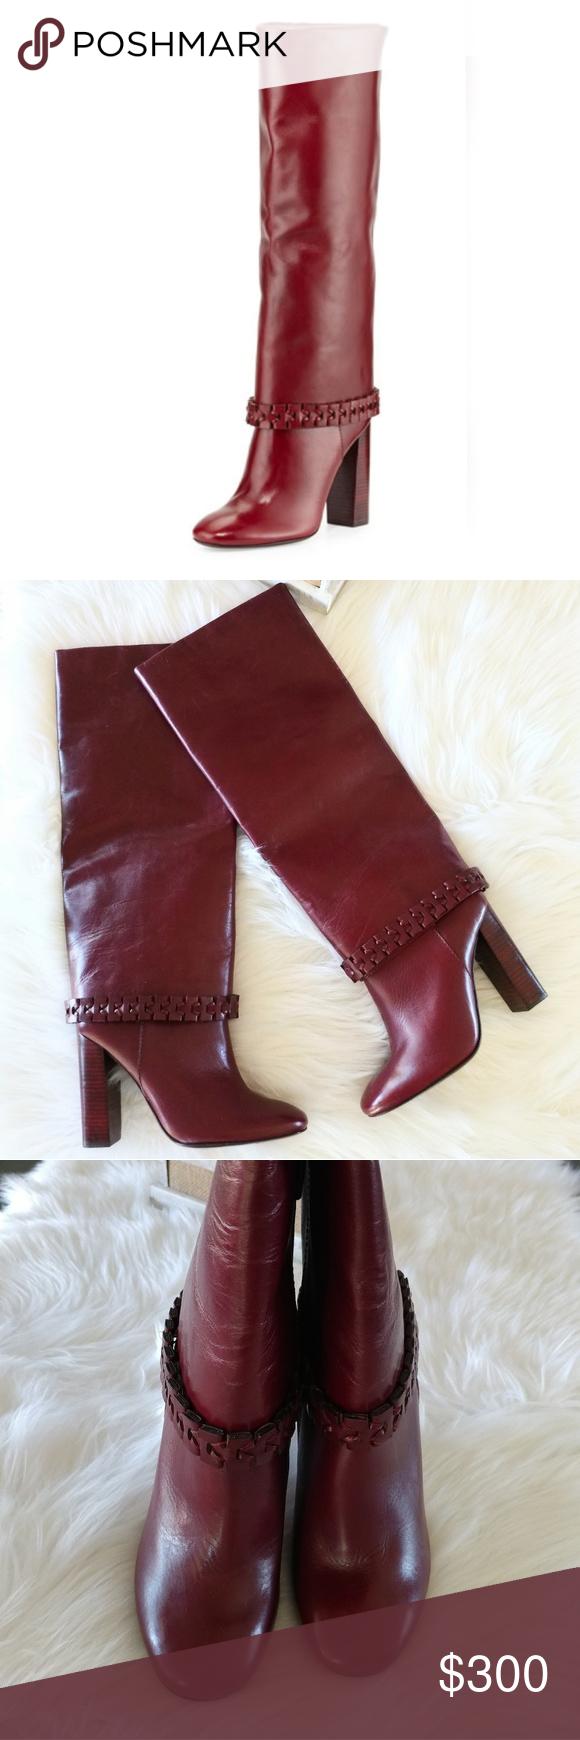 7e5c3075681 NEWTory Burch Sarava Leather Knee Boot